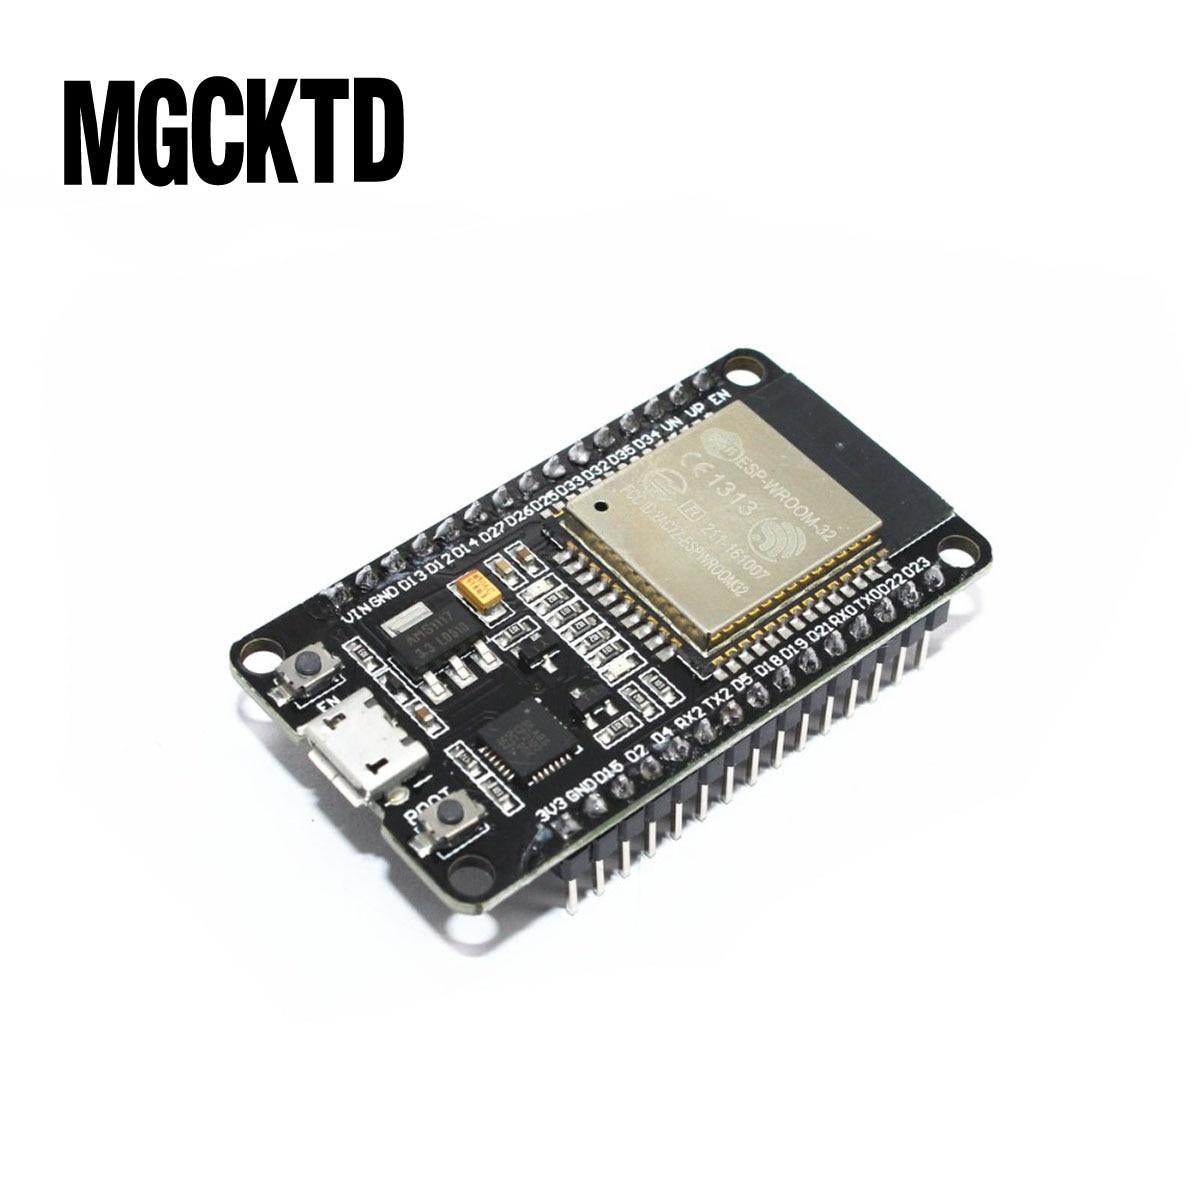 Aliexpress - DOIT ESP32 DEVKIT V1 Board (Wi-Fi and Bluetooth)